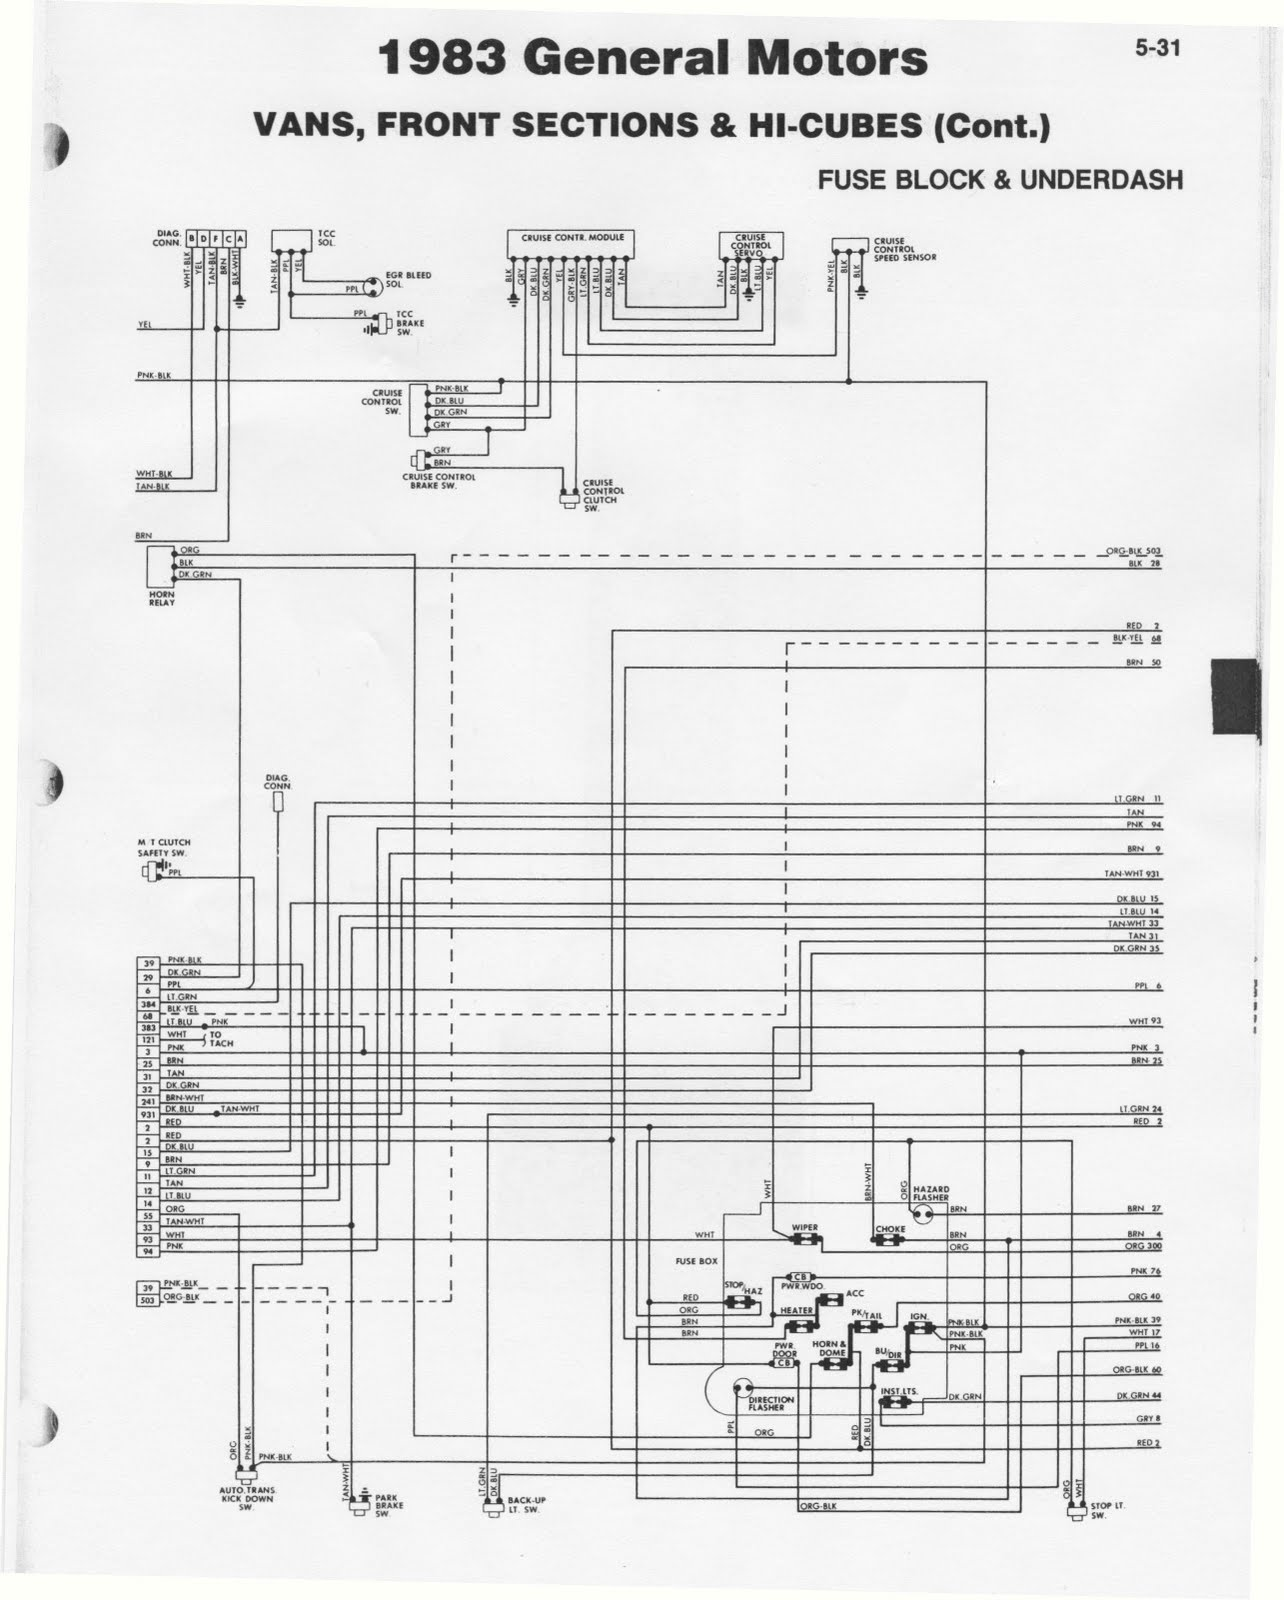 2001 itasca sunrise wiring diagram wiring library Fleetwood Motorhome Electrical Diagram 2001 itasca sunrise wiring diagram schematic diagrams 1990 fleetwood southwind wiring diagram turn signal wiring diagram